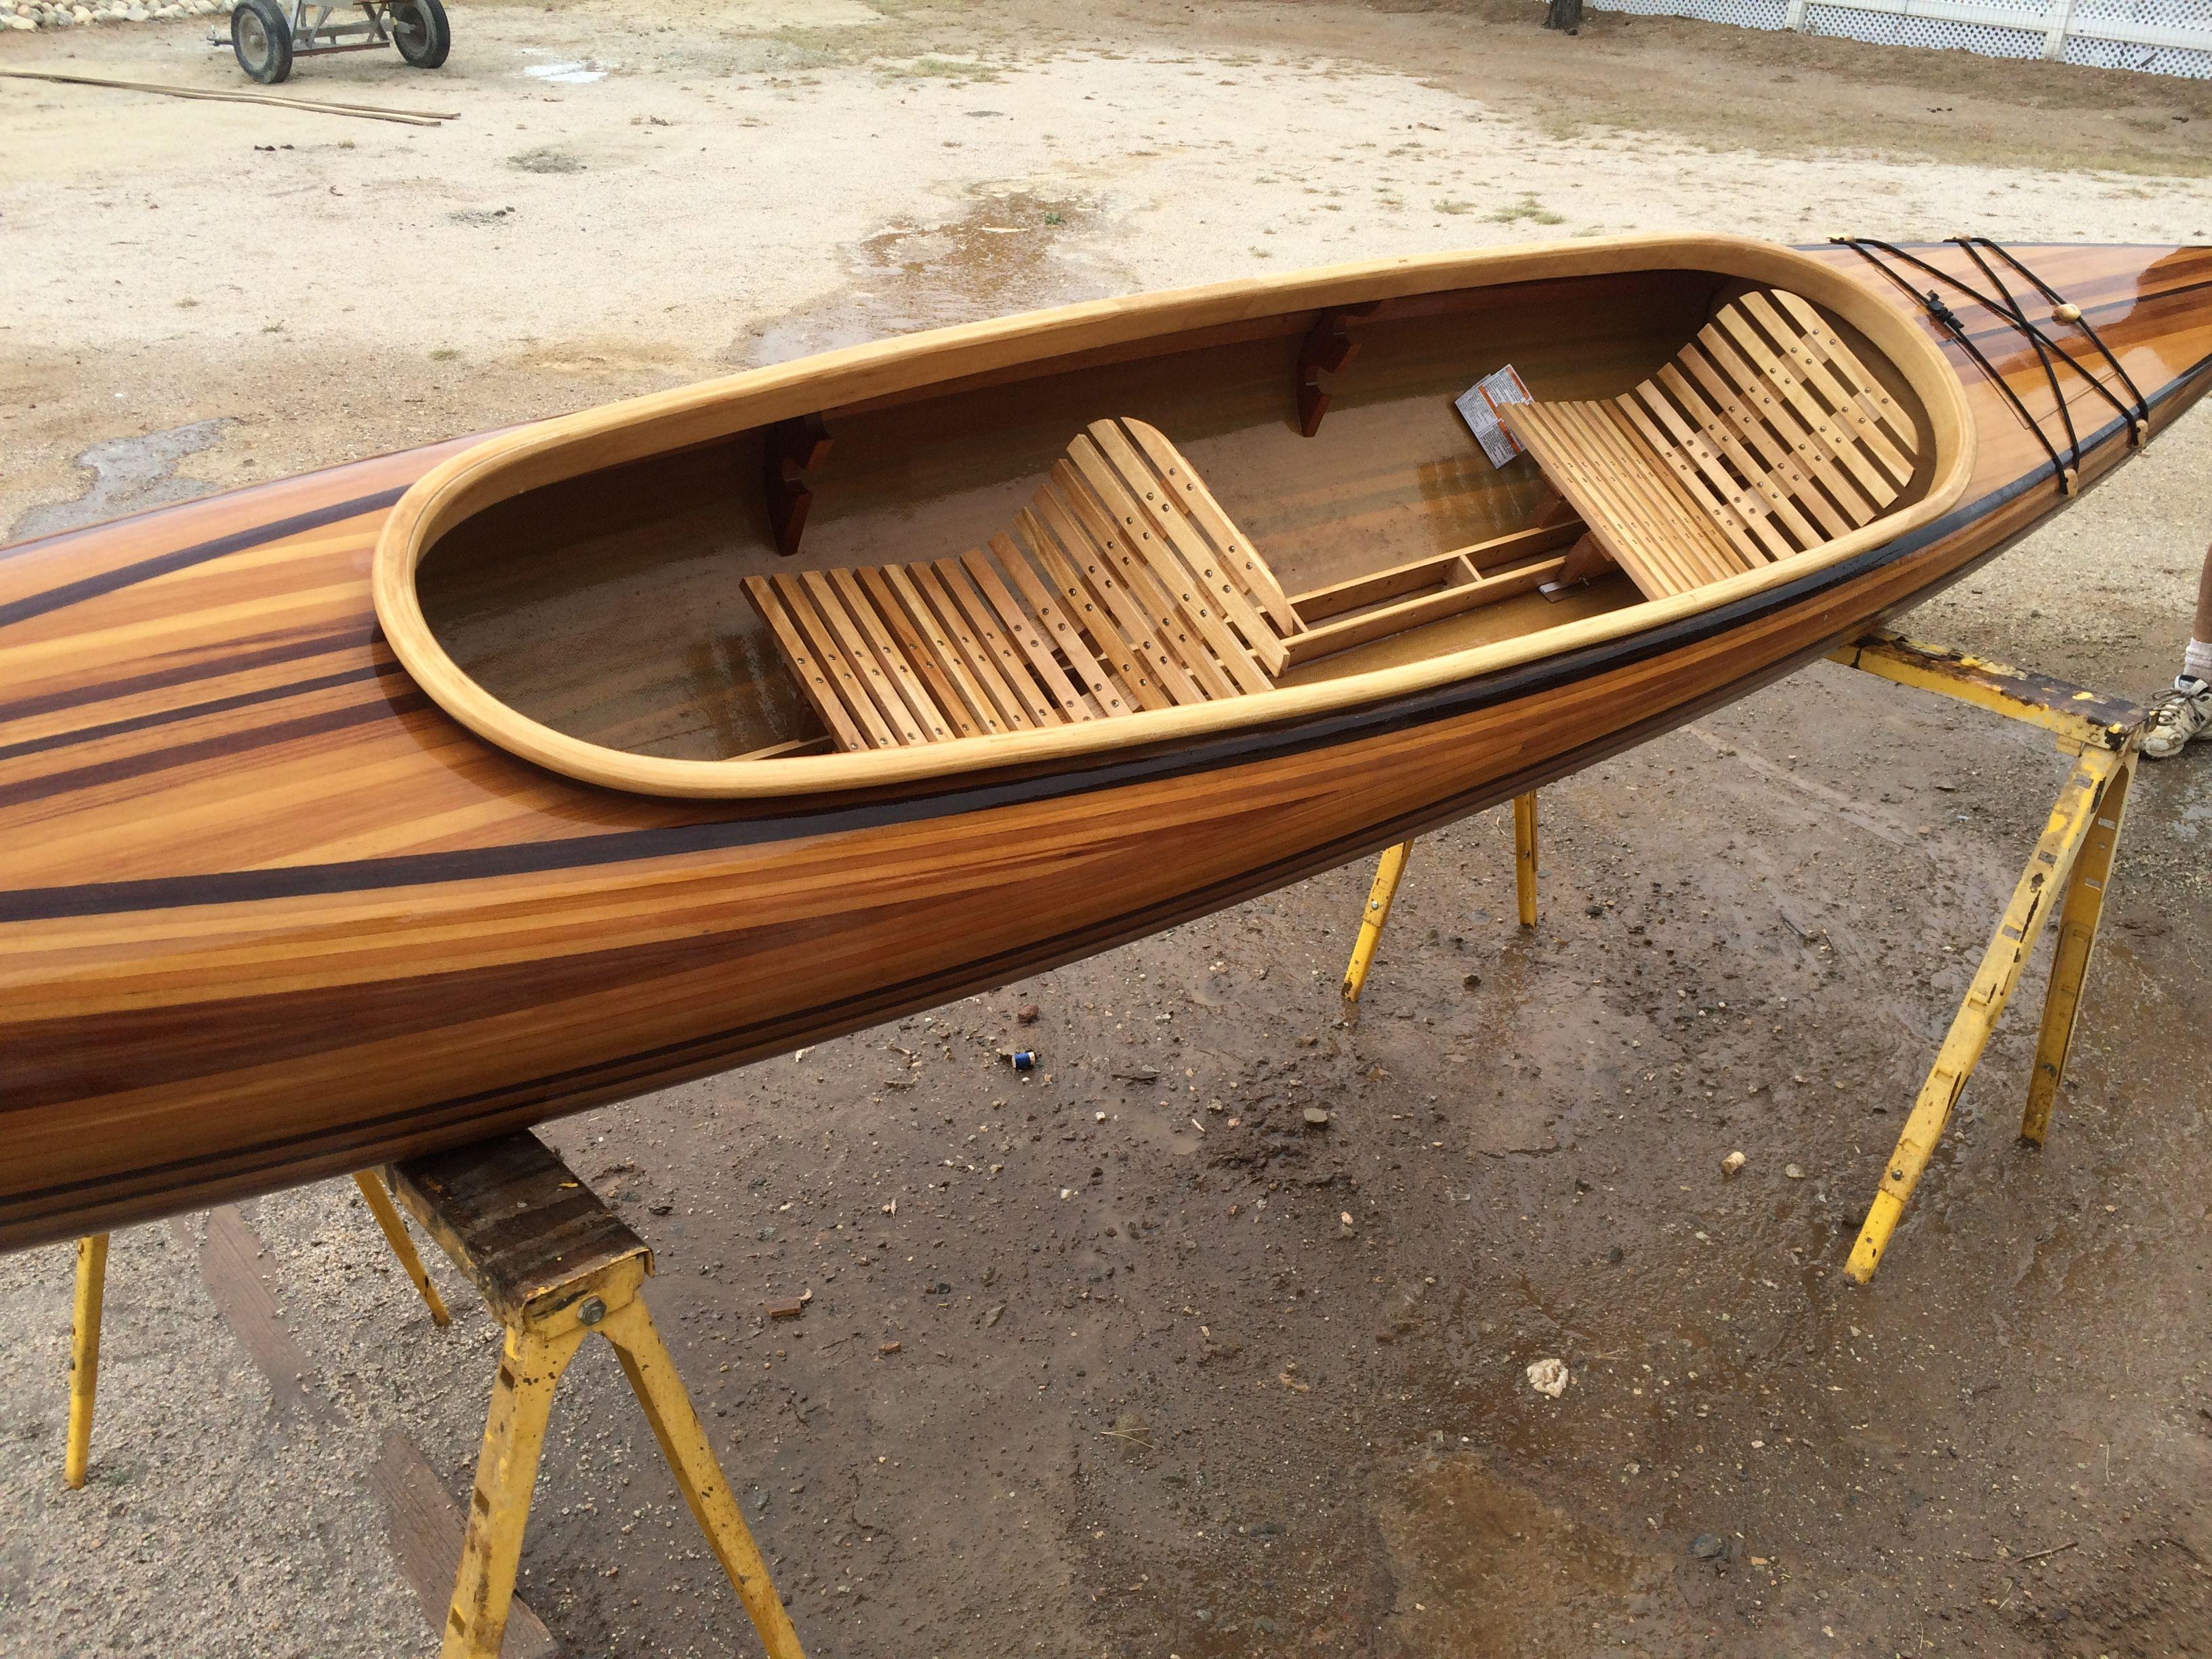 Skin on frame kayak plans - Explore Kayaks For Sale Custom Wood And More